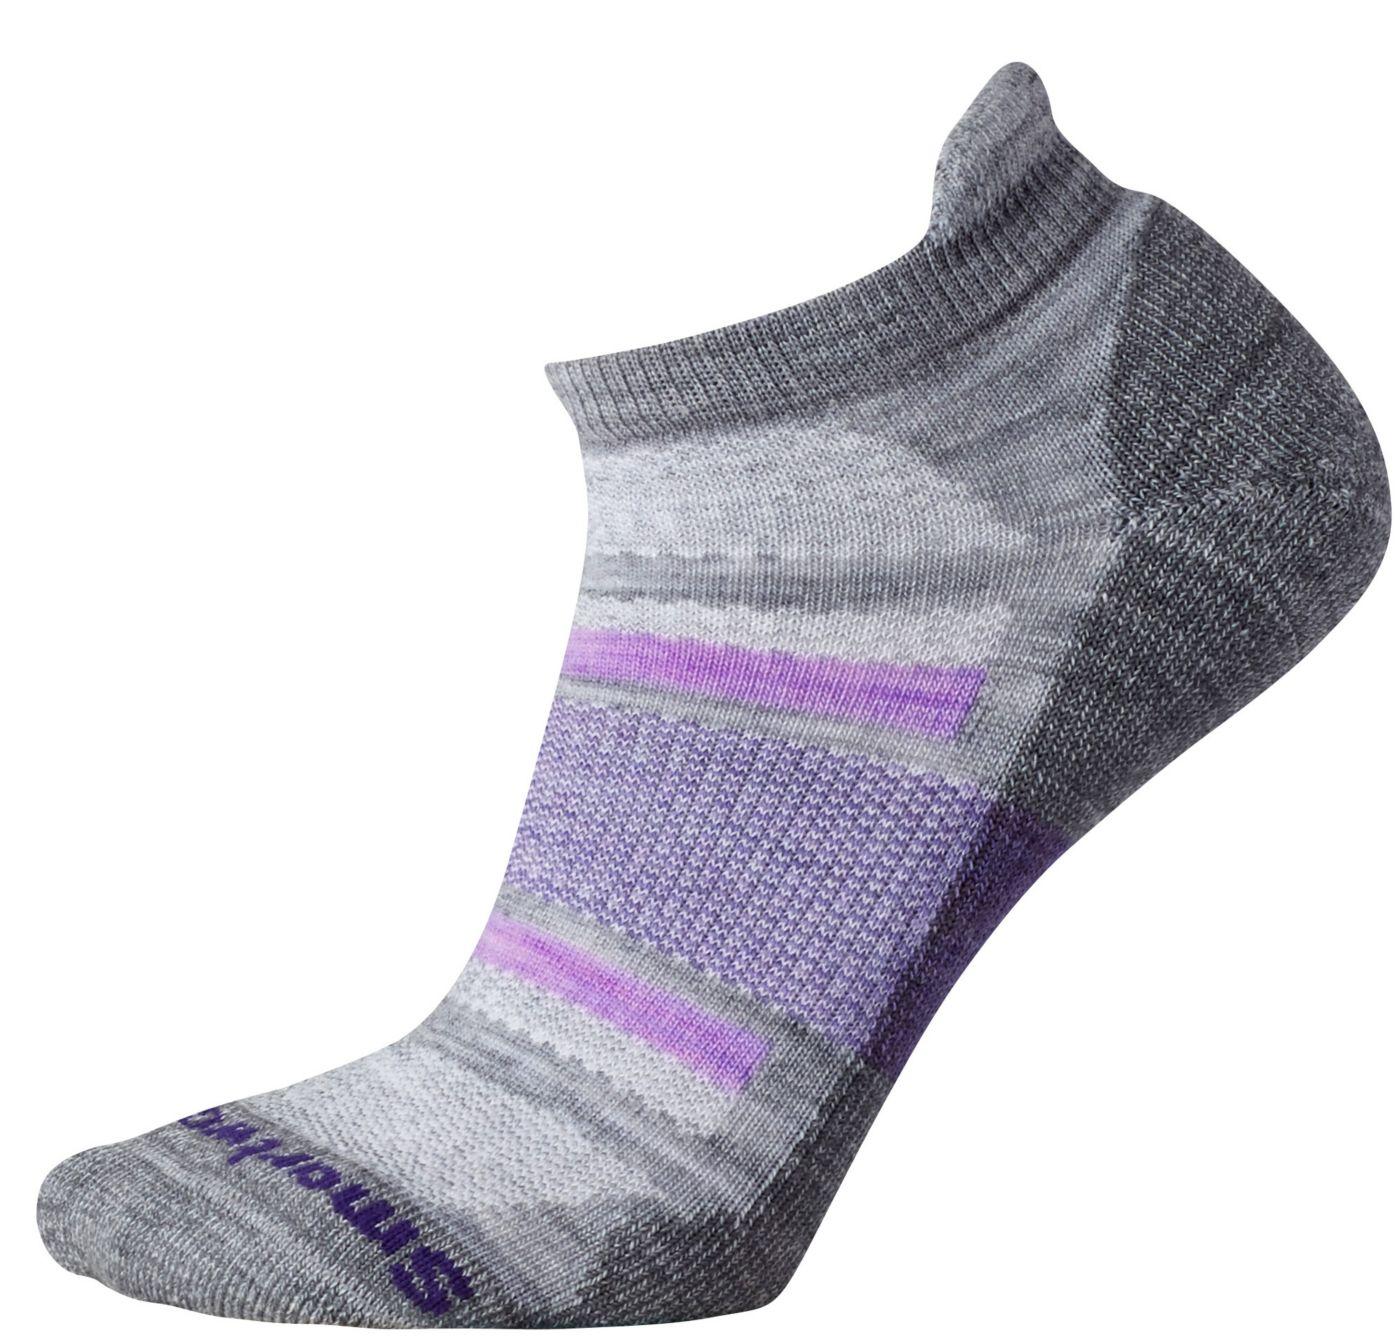 Smartwool Women's Outdoor Advanced Light Micro Hiking Socks